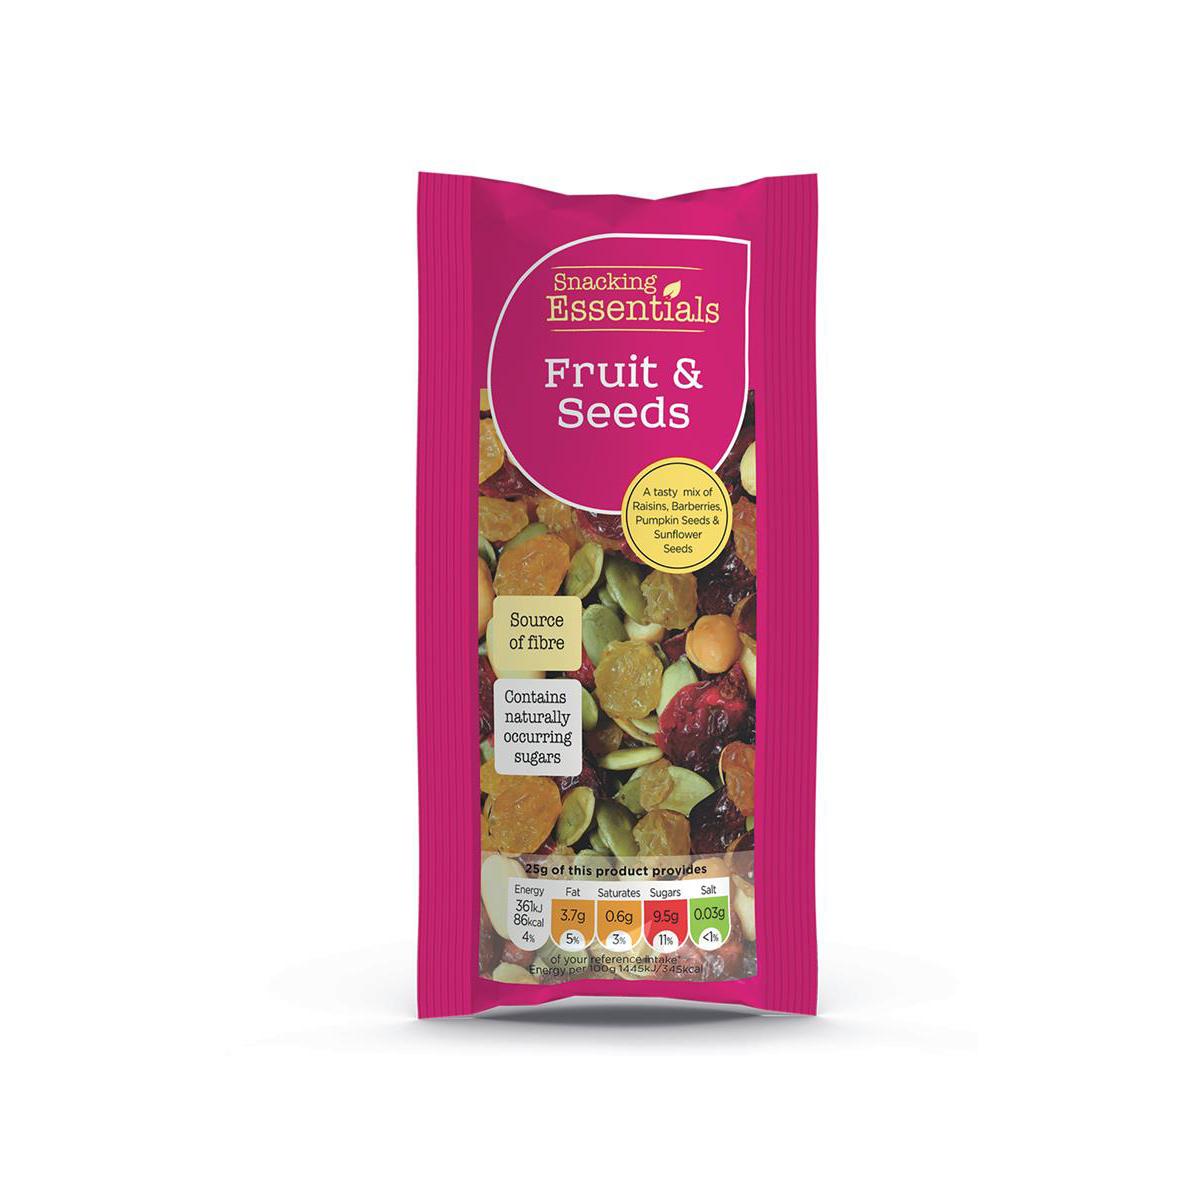 Snacking Essentials Fruit & Seeds Shots 50g Ref 808252 [Pack 16]